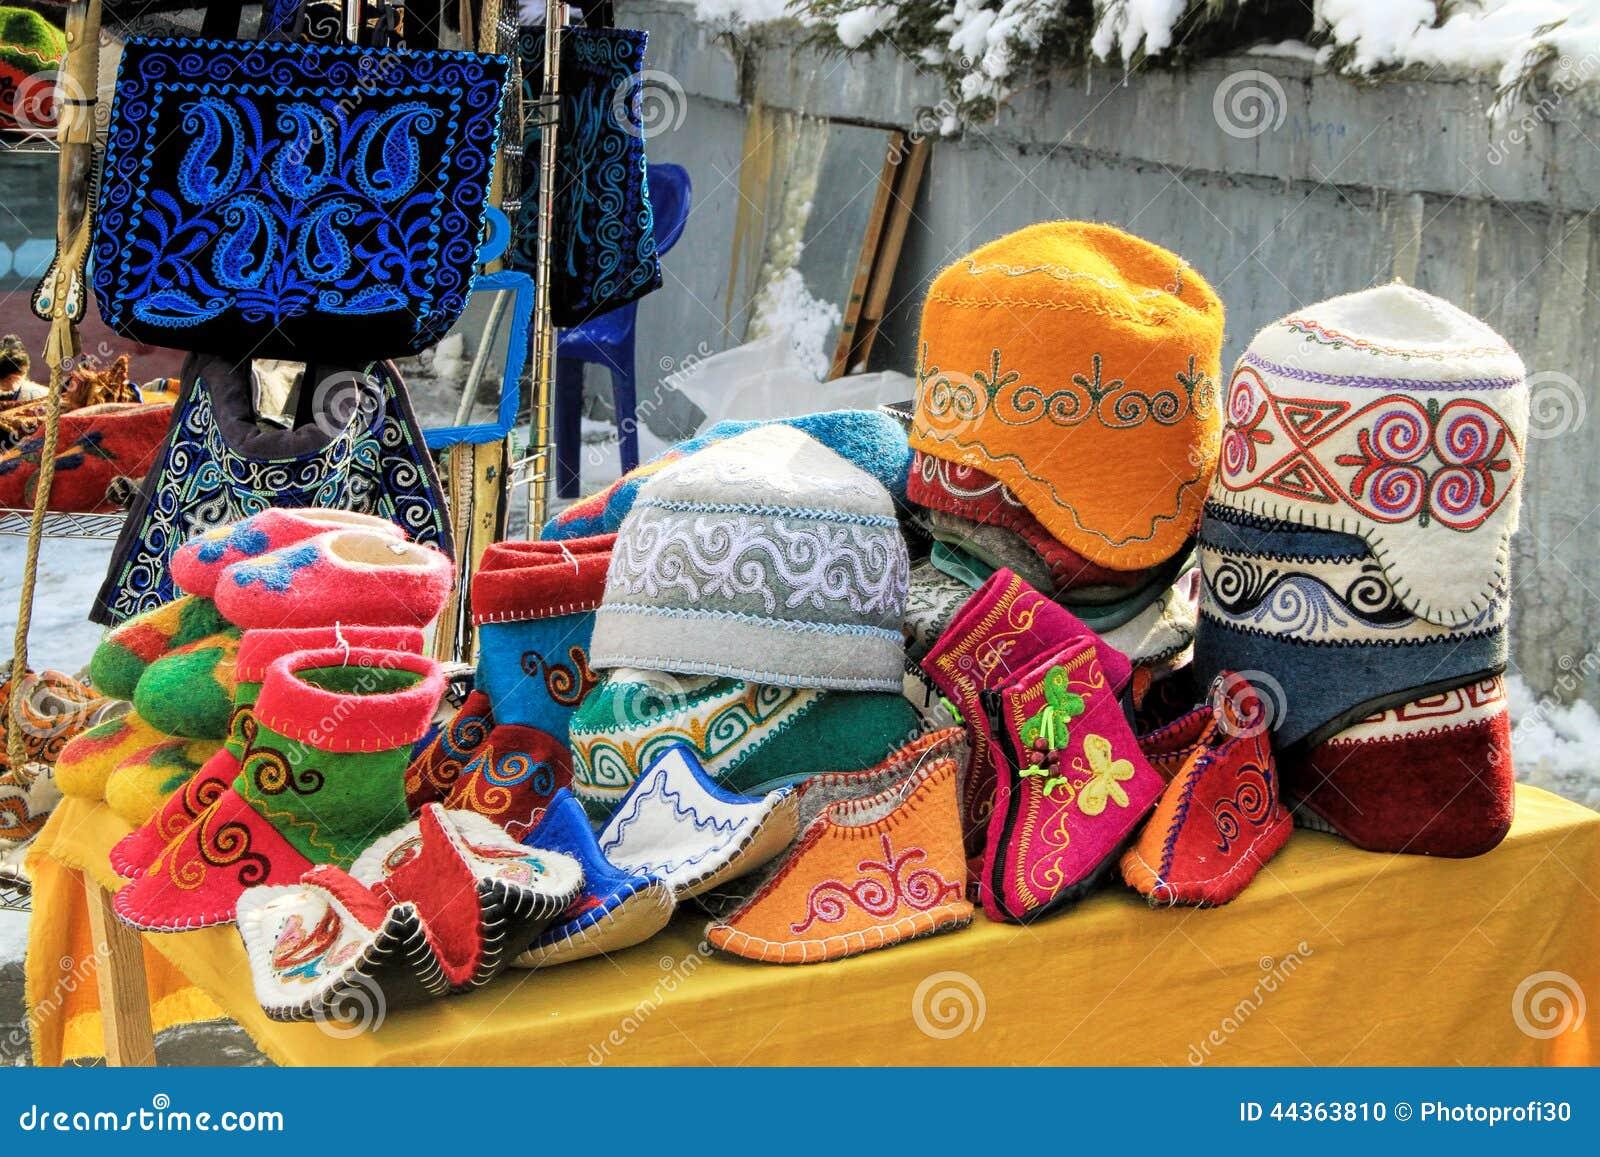 Kyrgyzstan Arts And Crafts